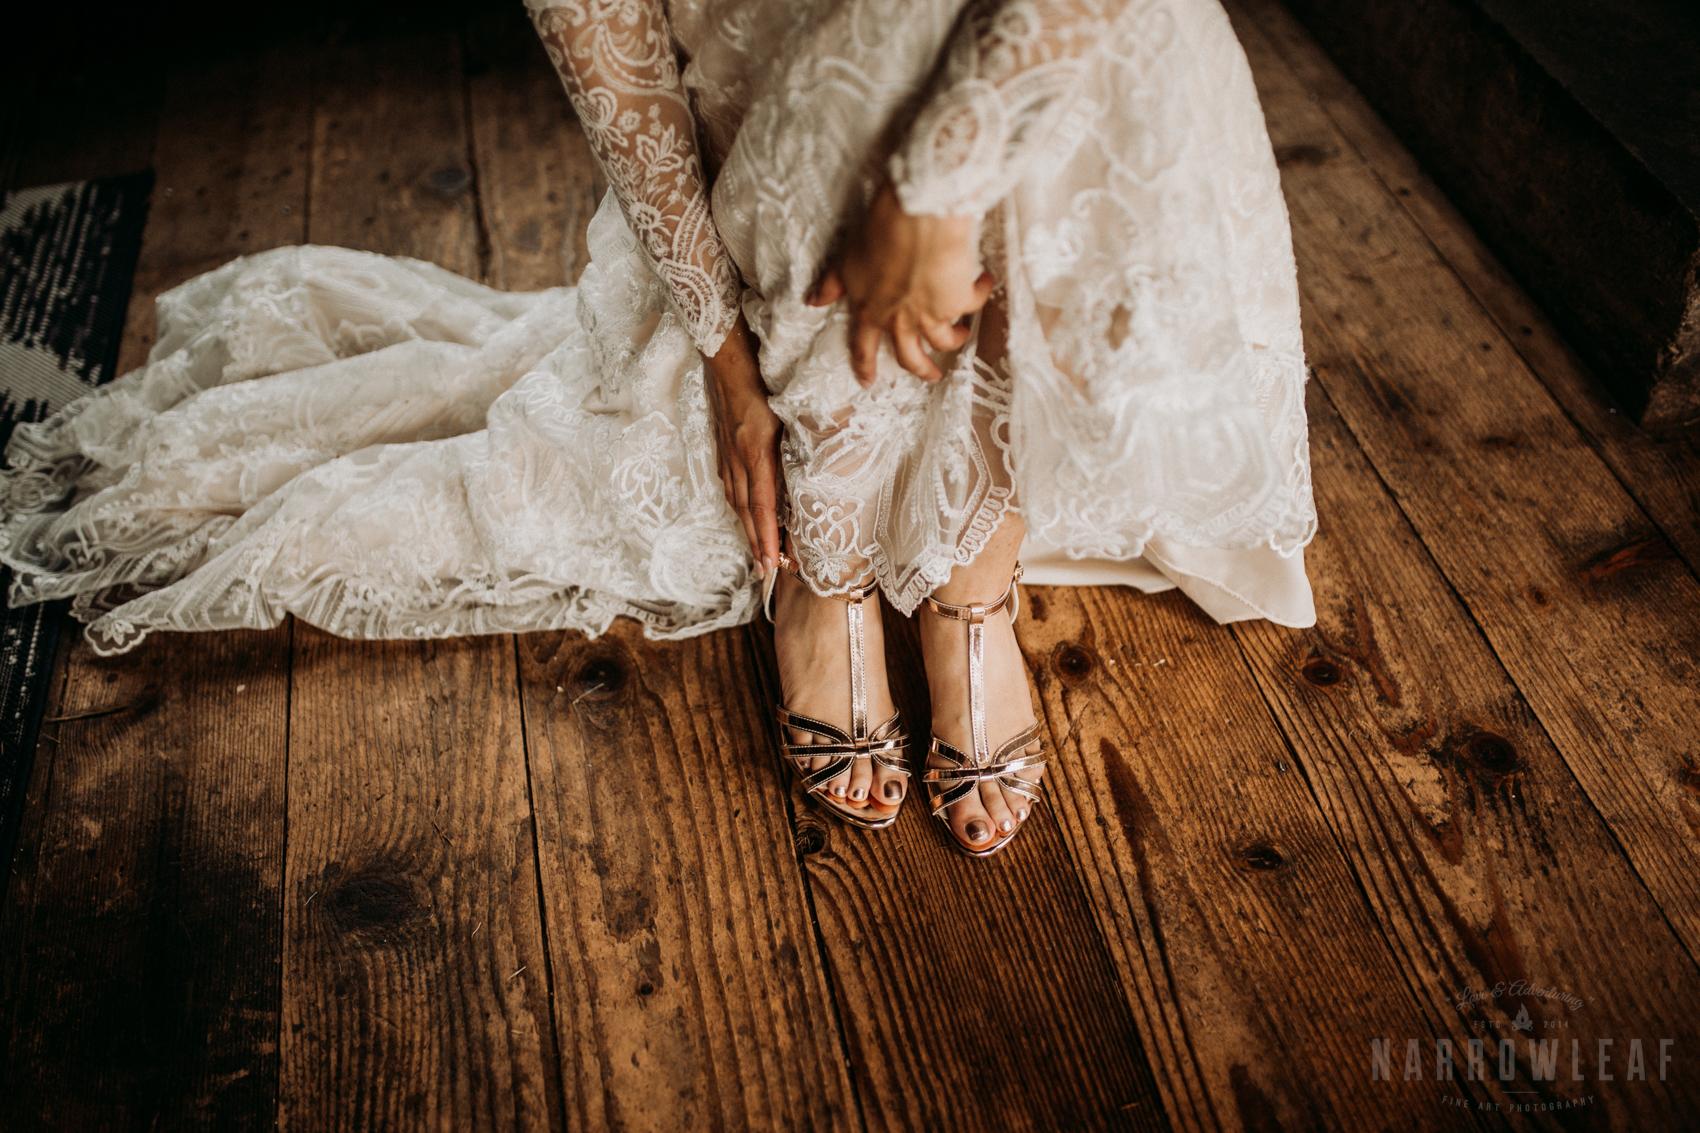 classy-bride-wedding-details-the-hidden-meadow-and-barn-pepin-wi-16.jpg